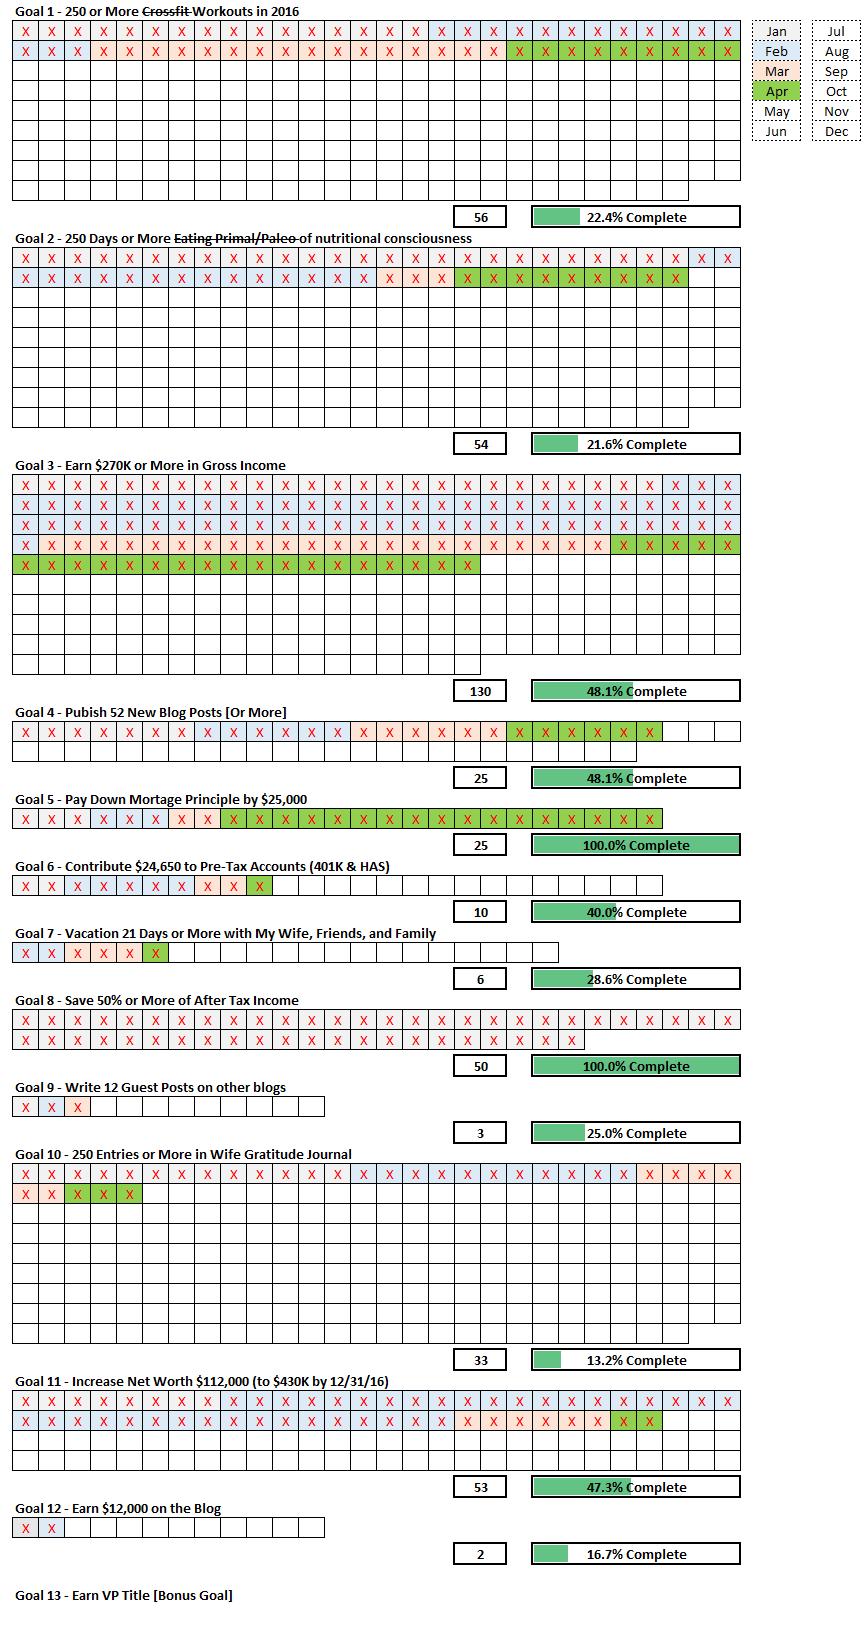 April 2016 Goal Tracking